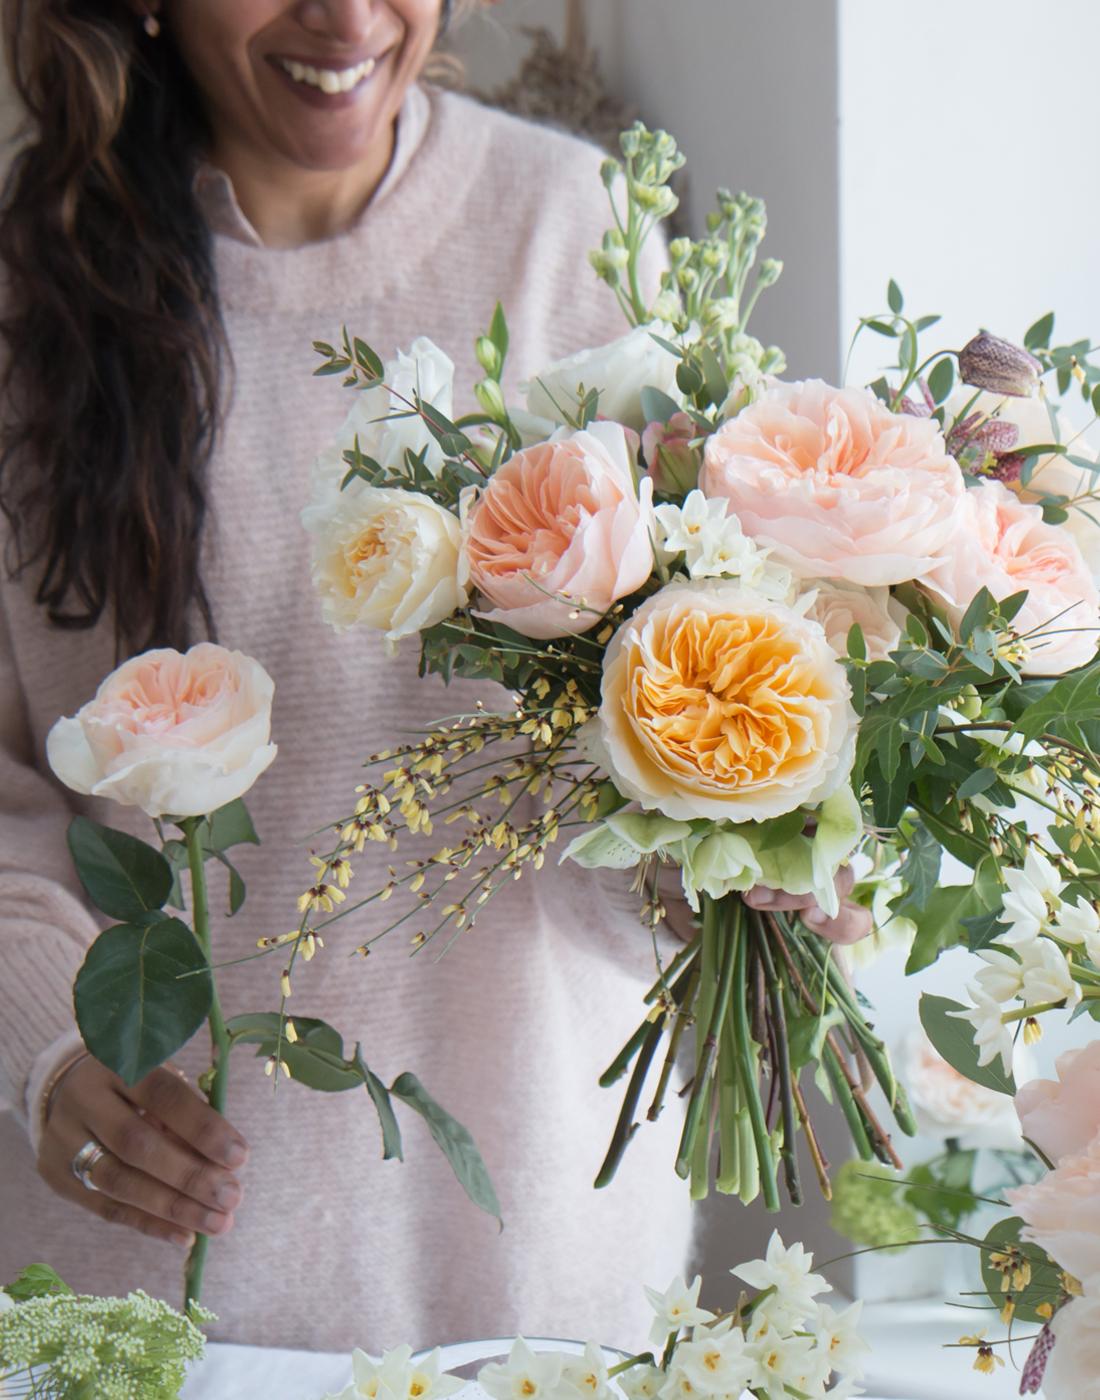 Florist creating spring bouquet using David Austin cut roses